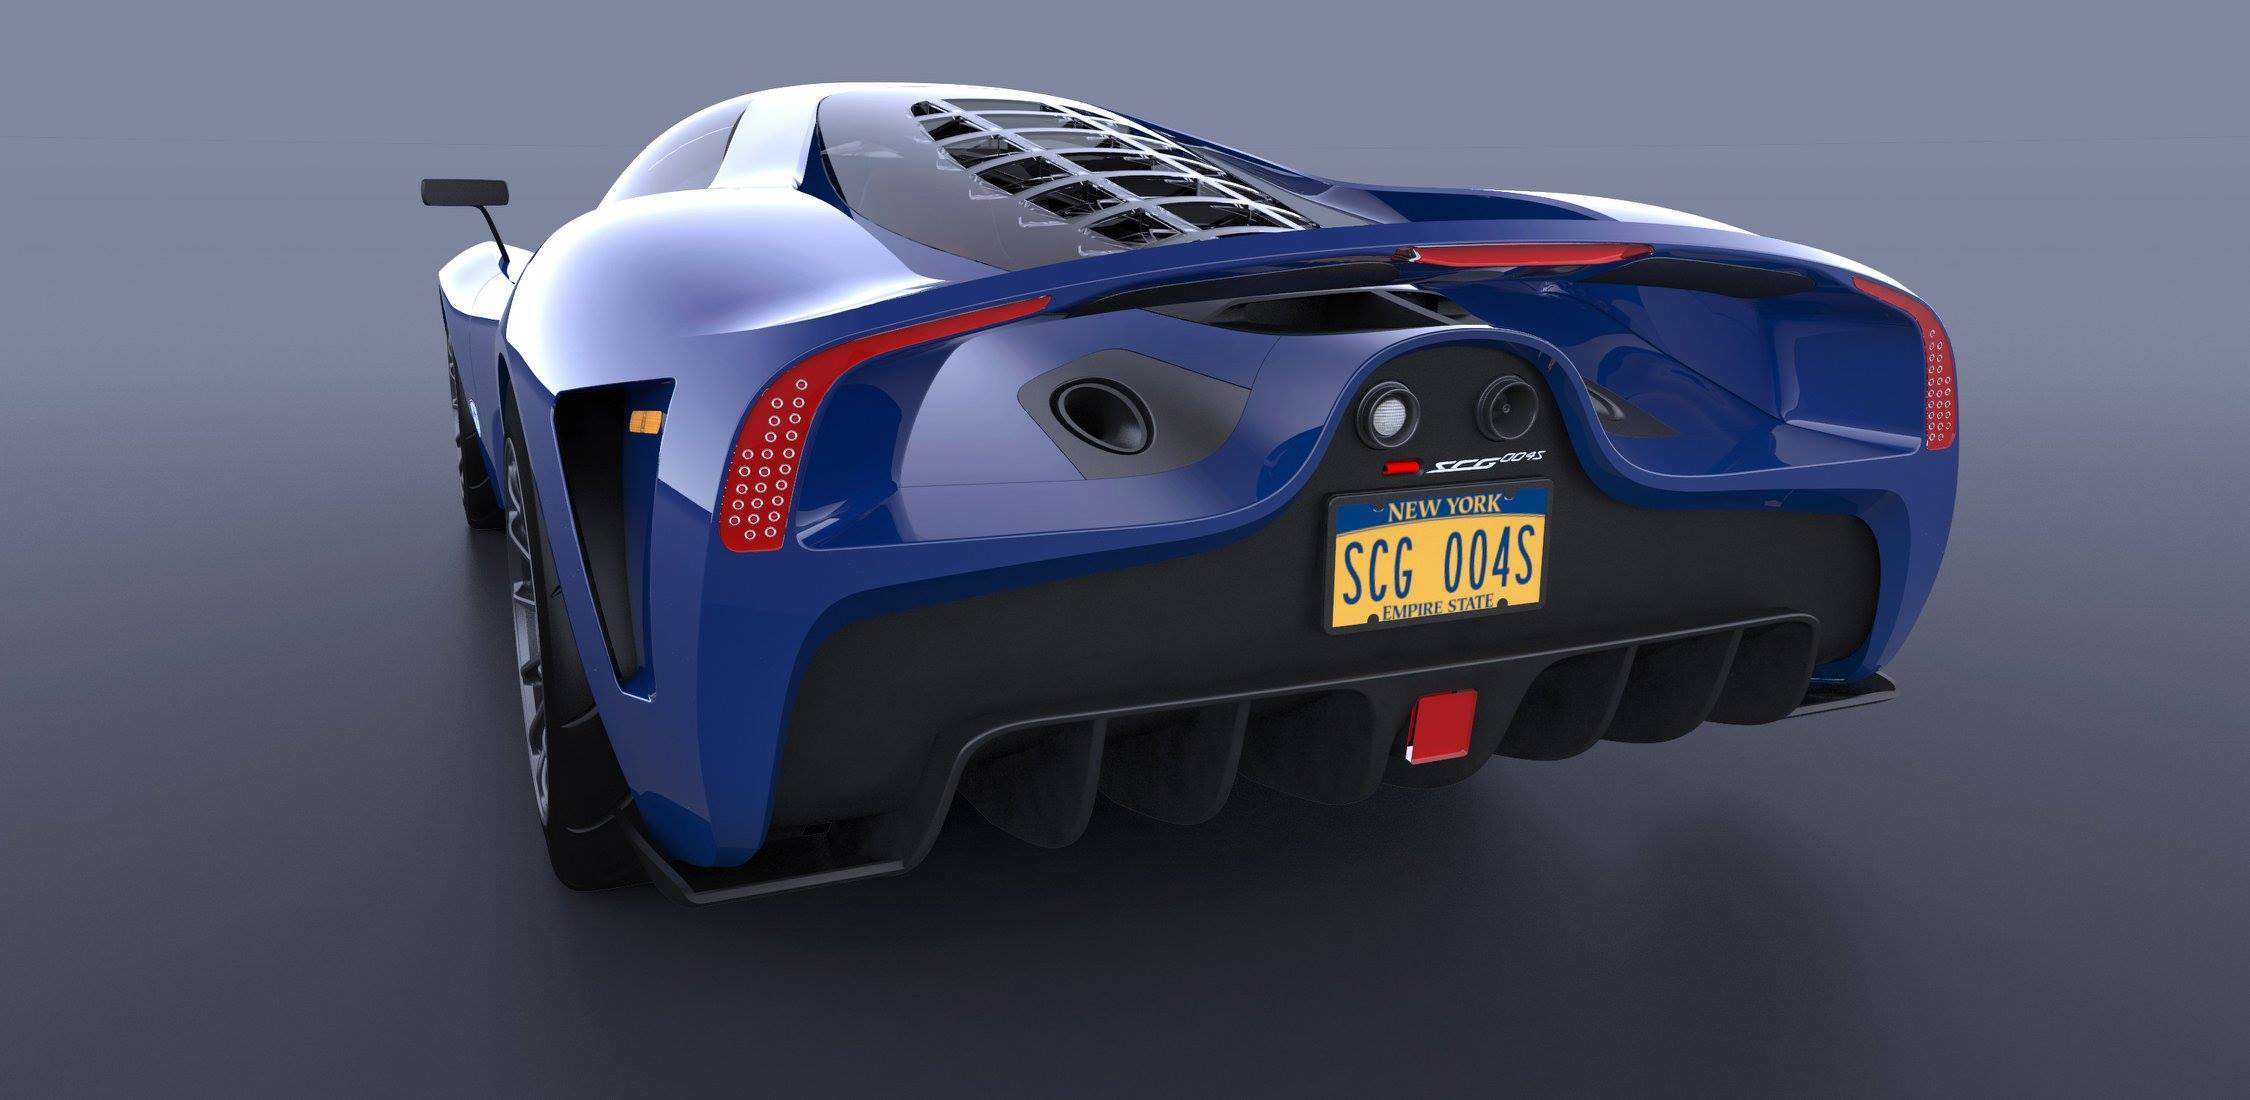 Scg 004s Swaps V8 Power For Nissan Gt R V6 Engine